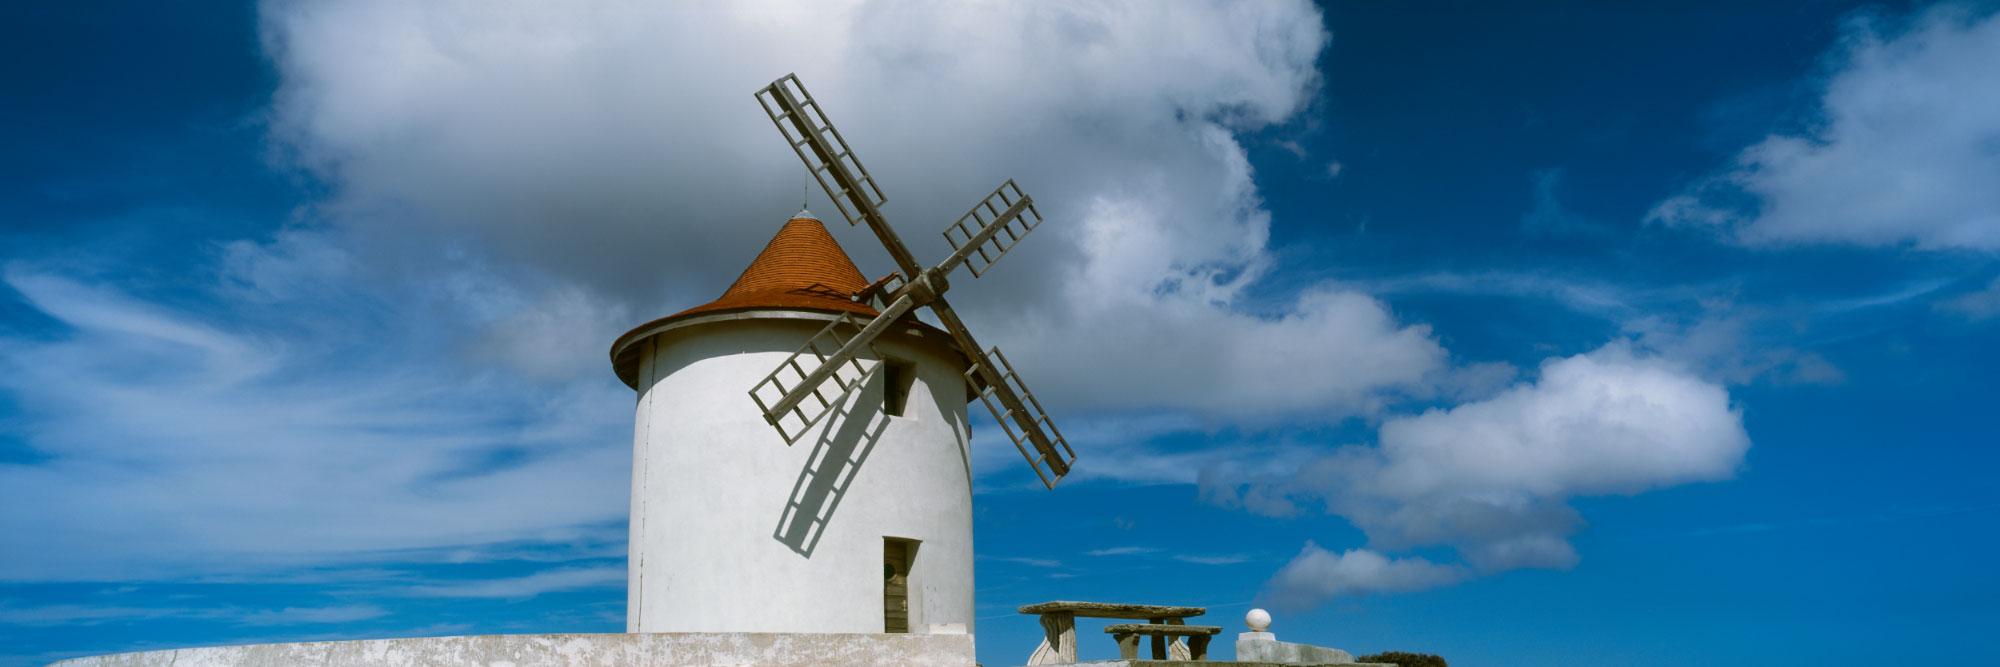 Moulin Mattei, Cap Corse